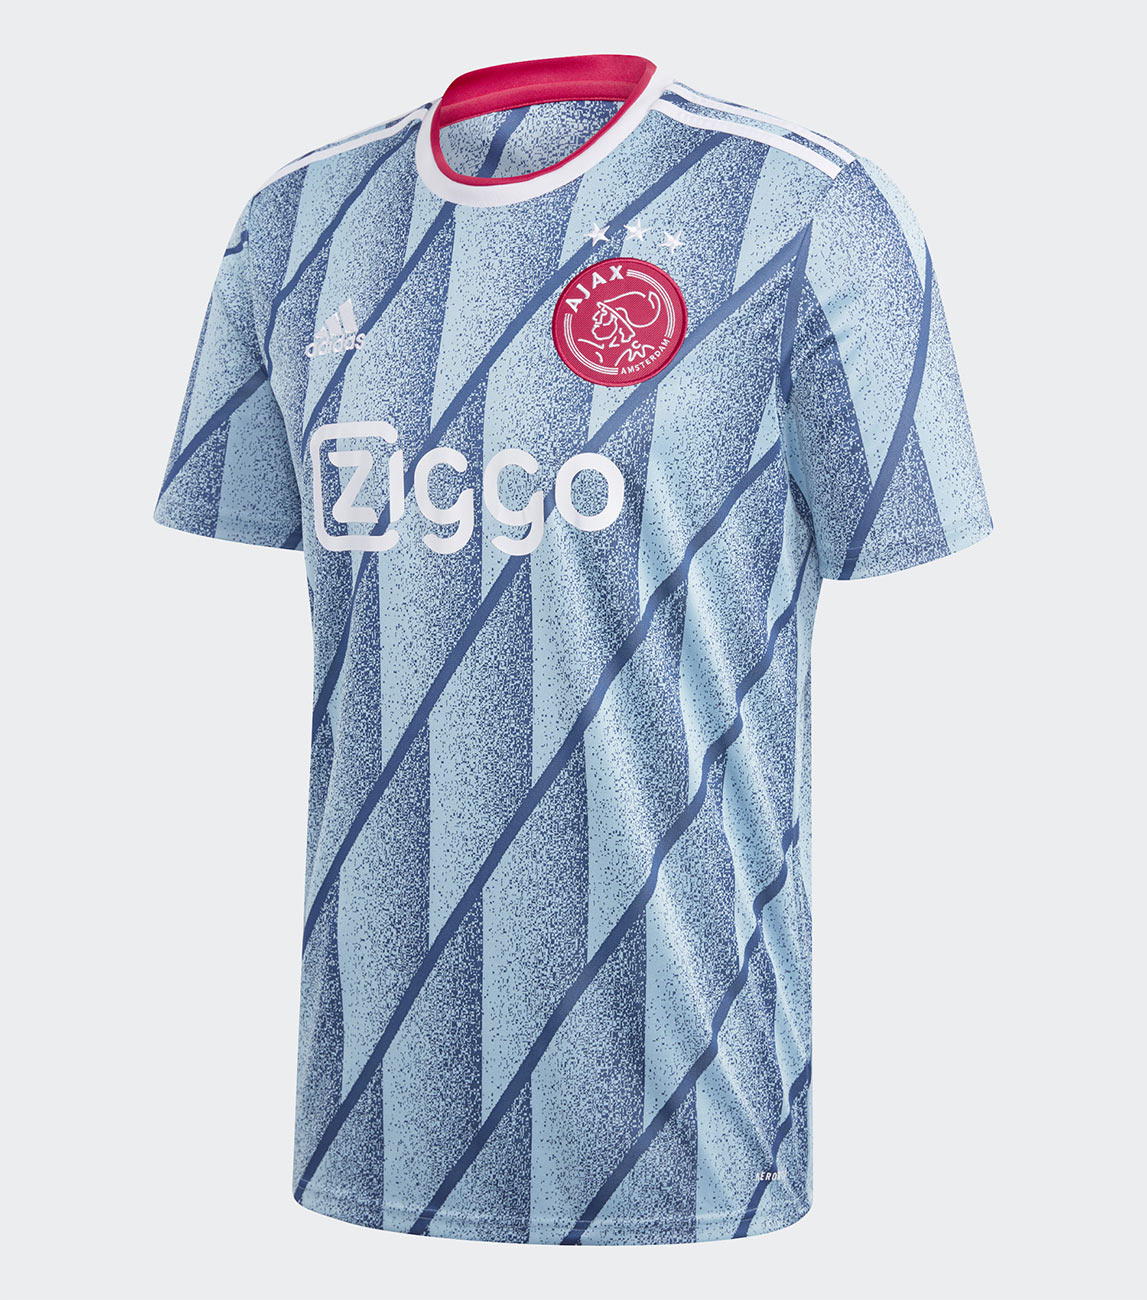 Maglia away Ajax 2020-2021, Adidas osa con un look anni 90